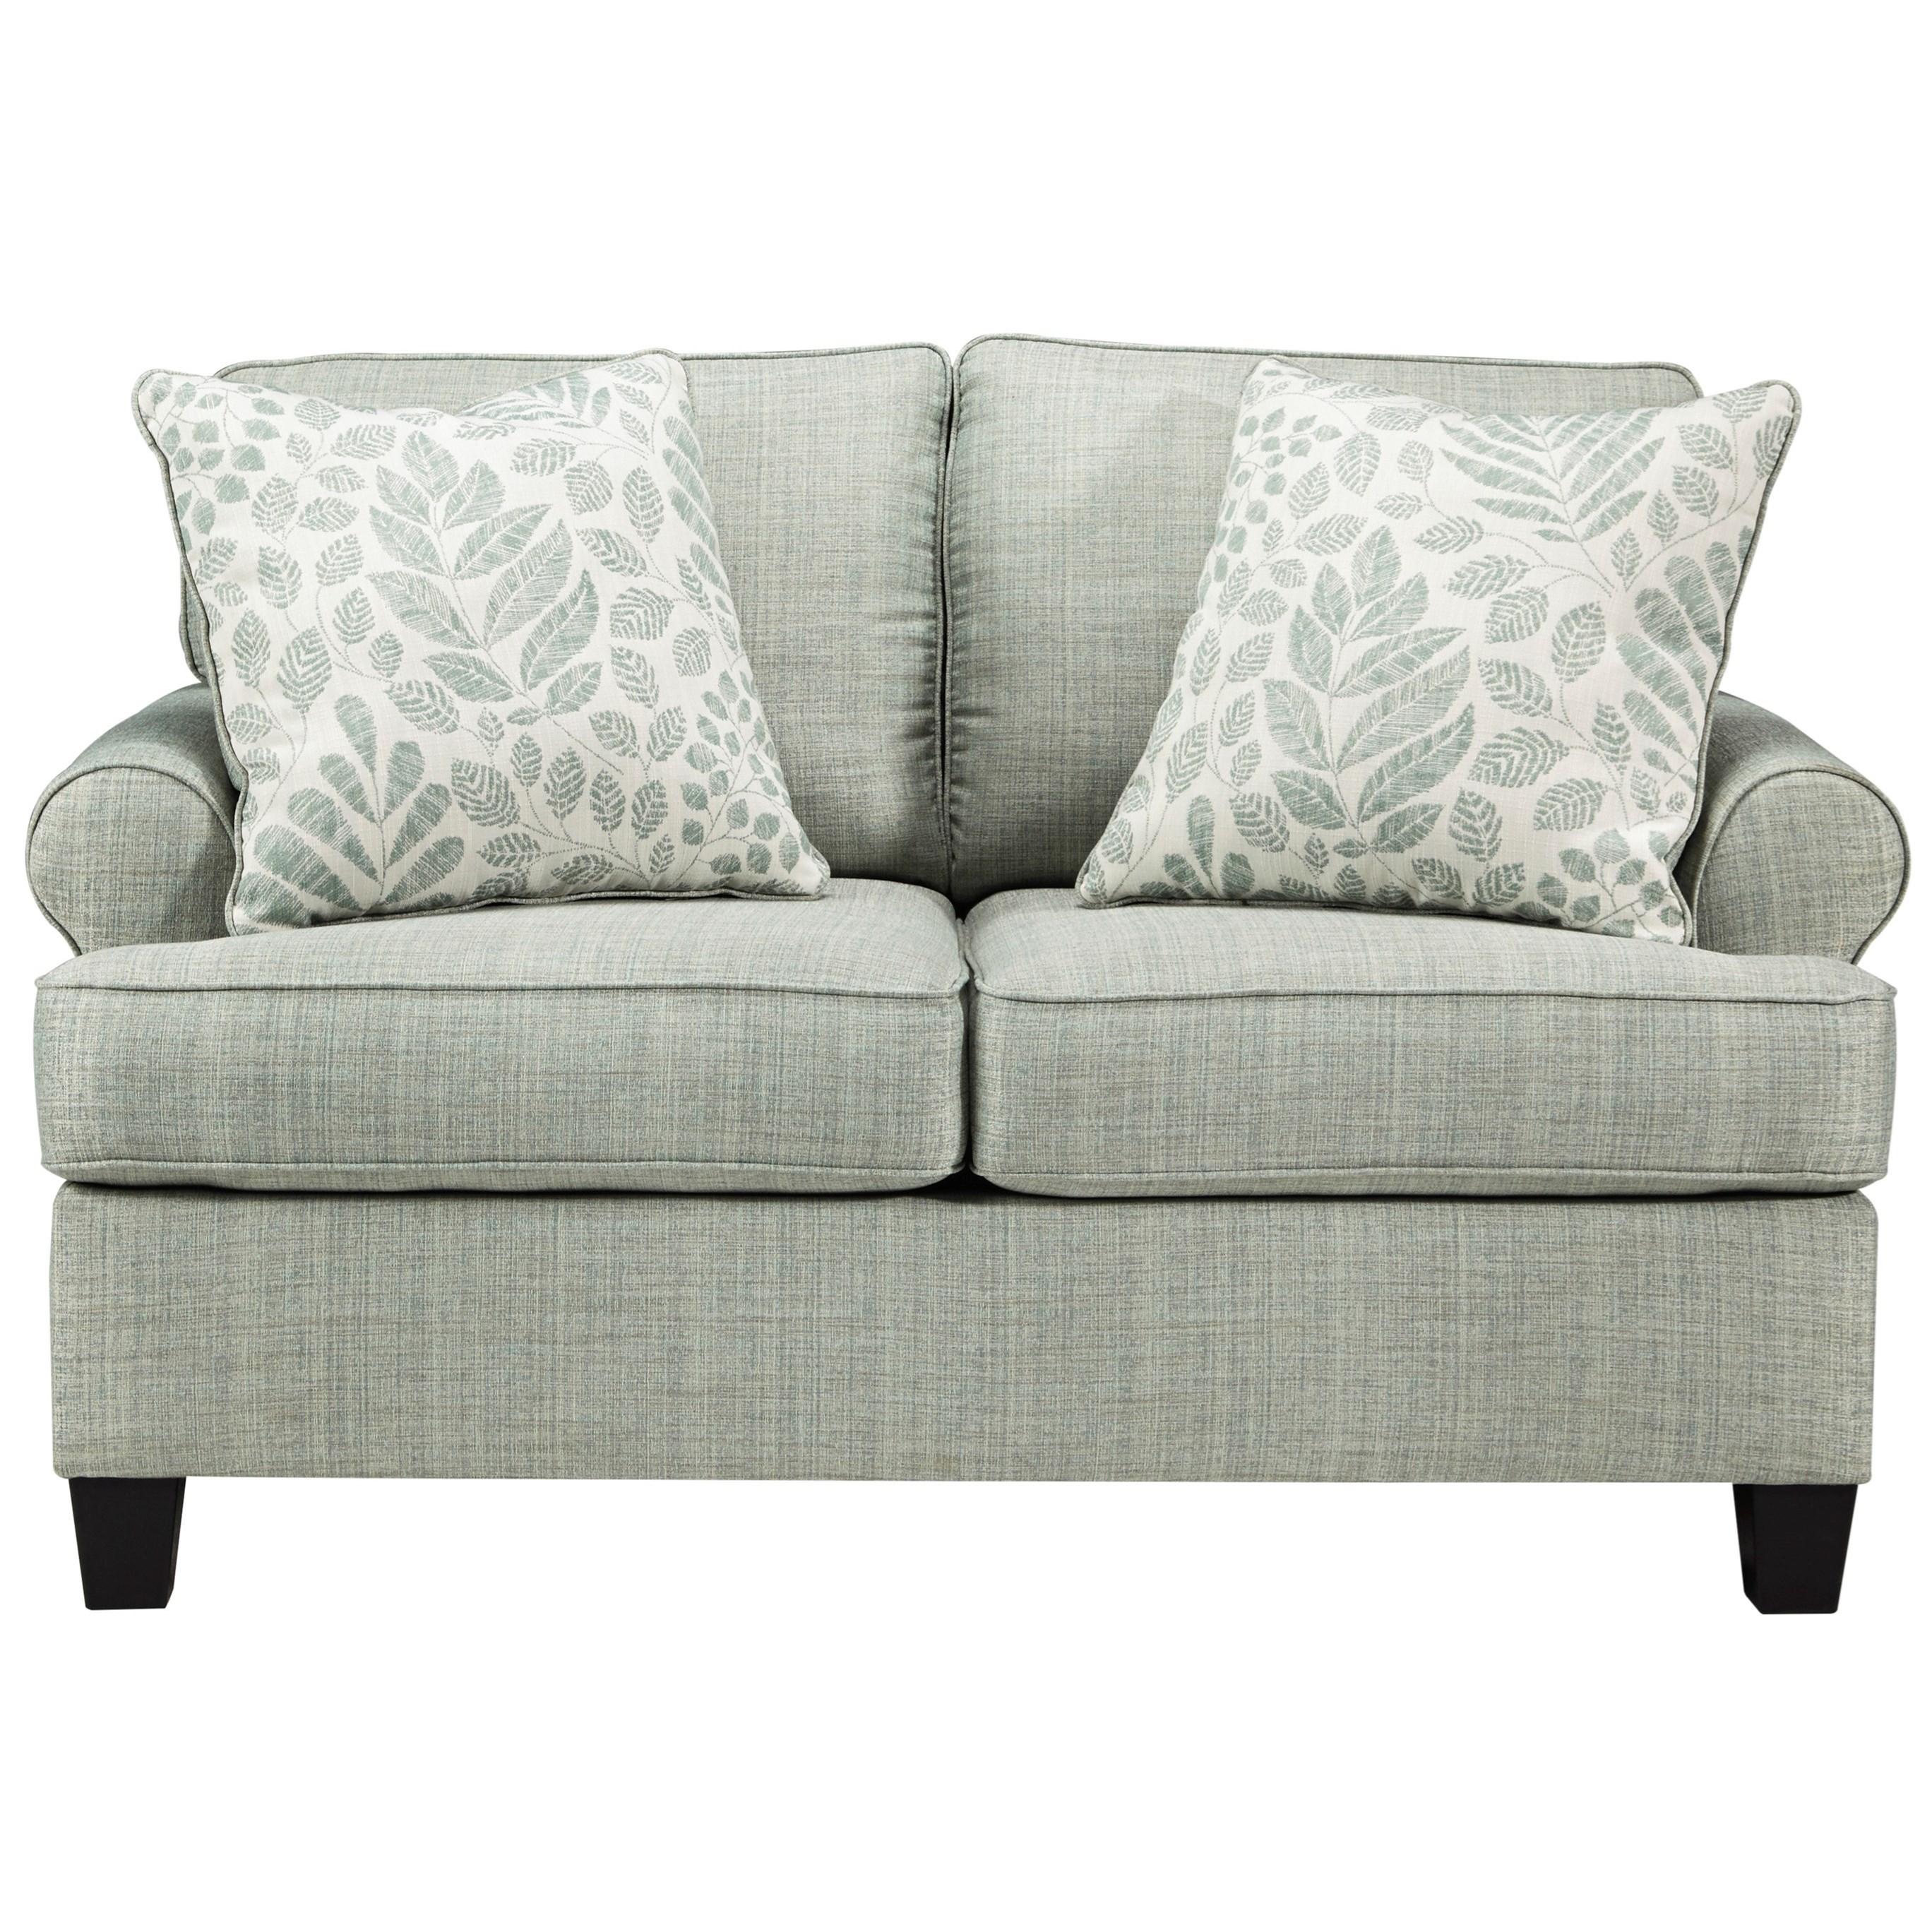 Kilarney Loveseat by Signature Design by Ashley at HomeWorld Furniture